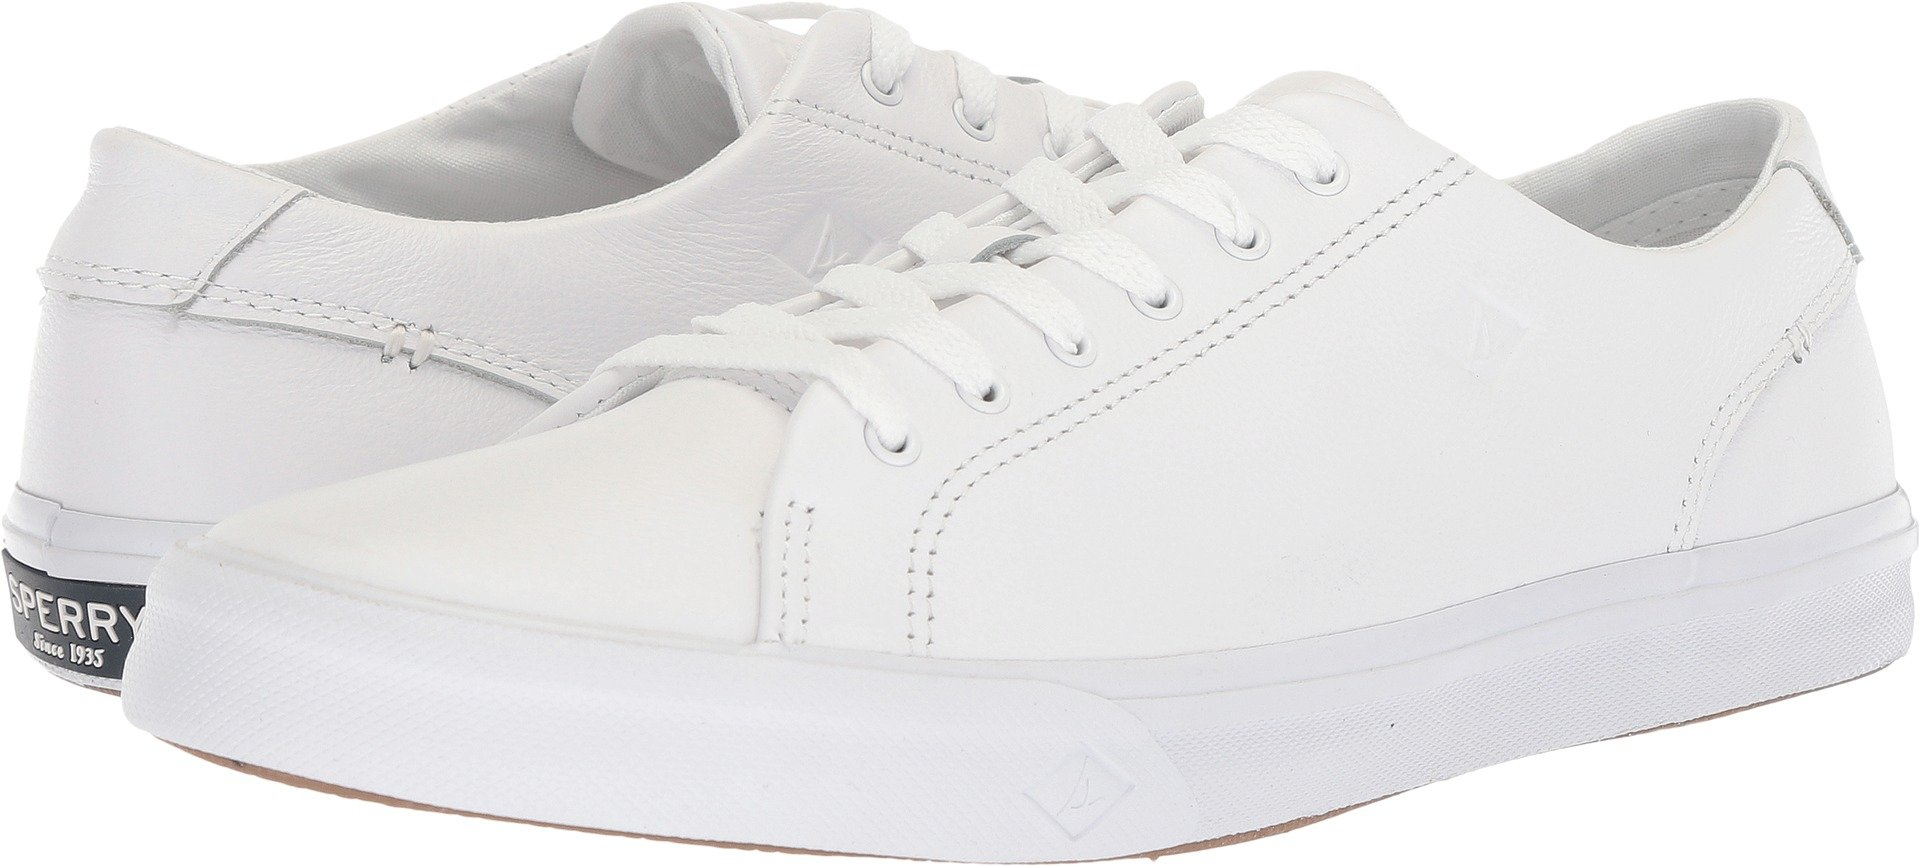 Sperry Mens Striper II LTT Leather Sneaker, White, 10